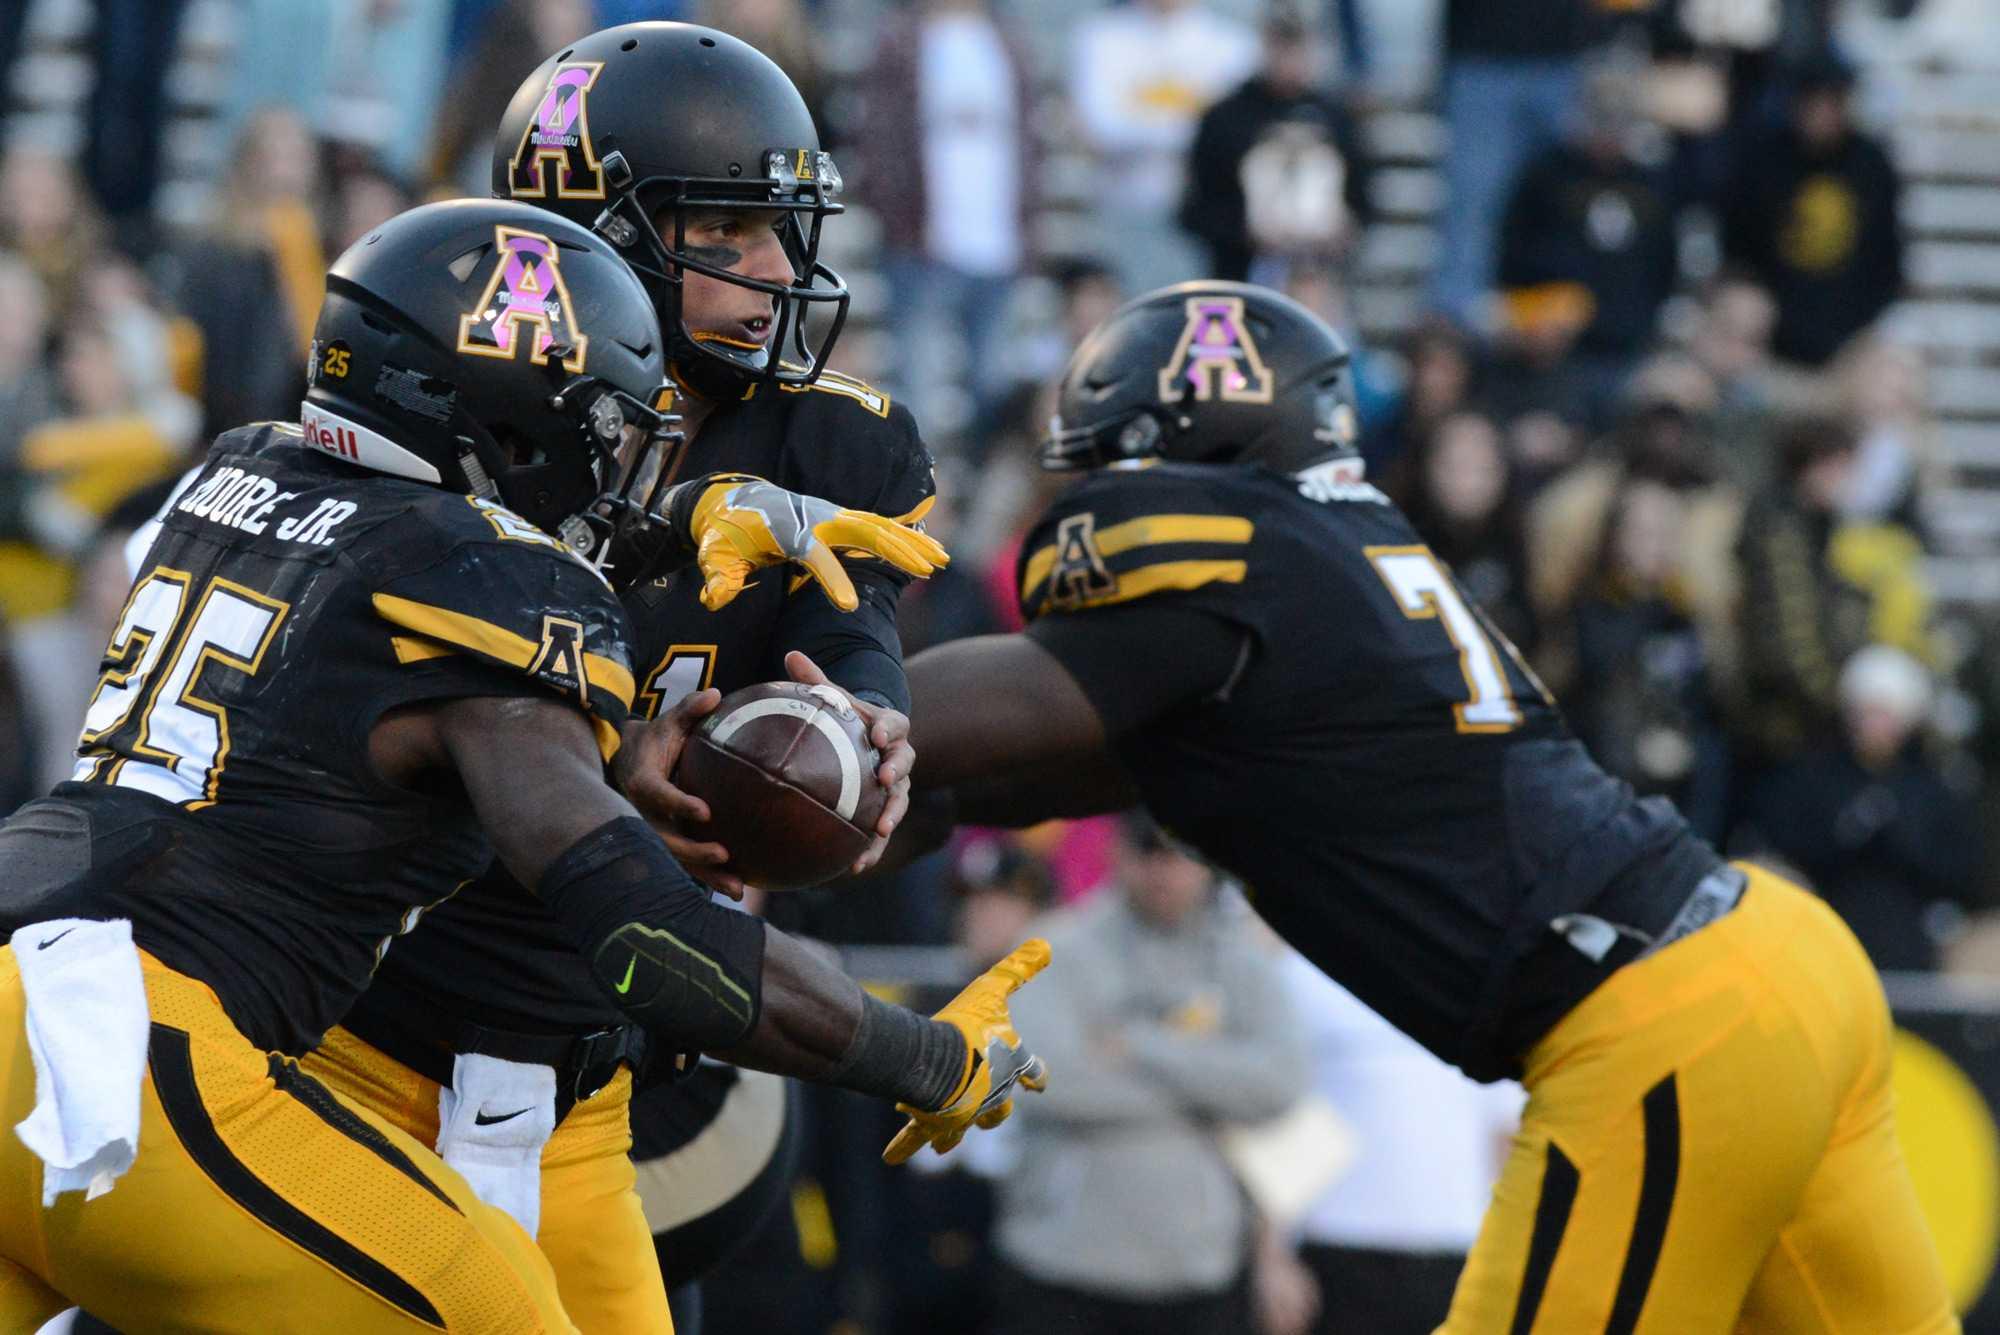 Junior quarterback Taylor Lamb hands the ball off to Sophomore running back Jalin Moore.